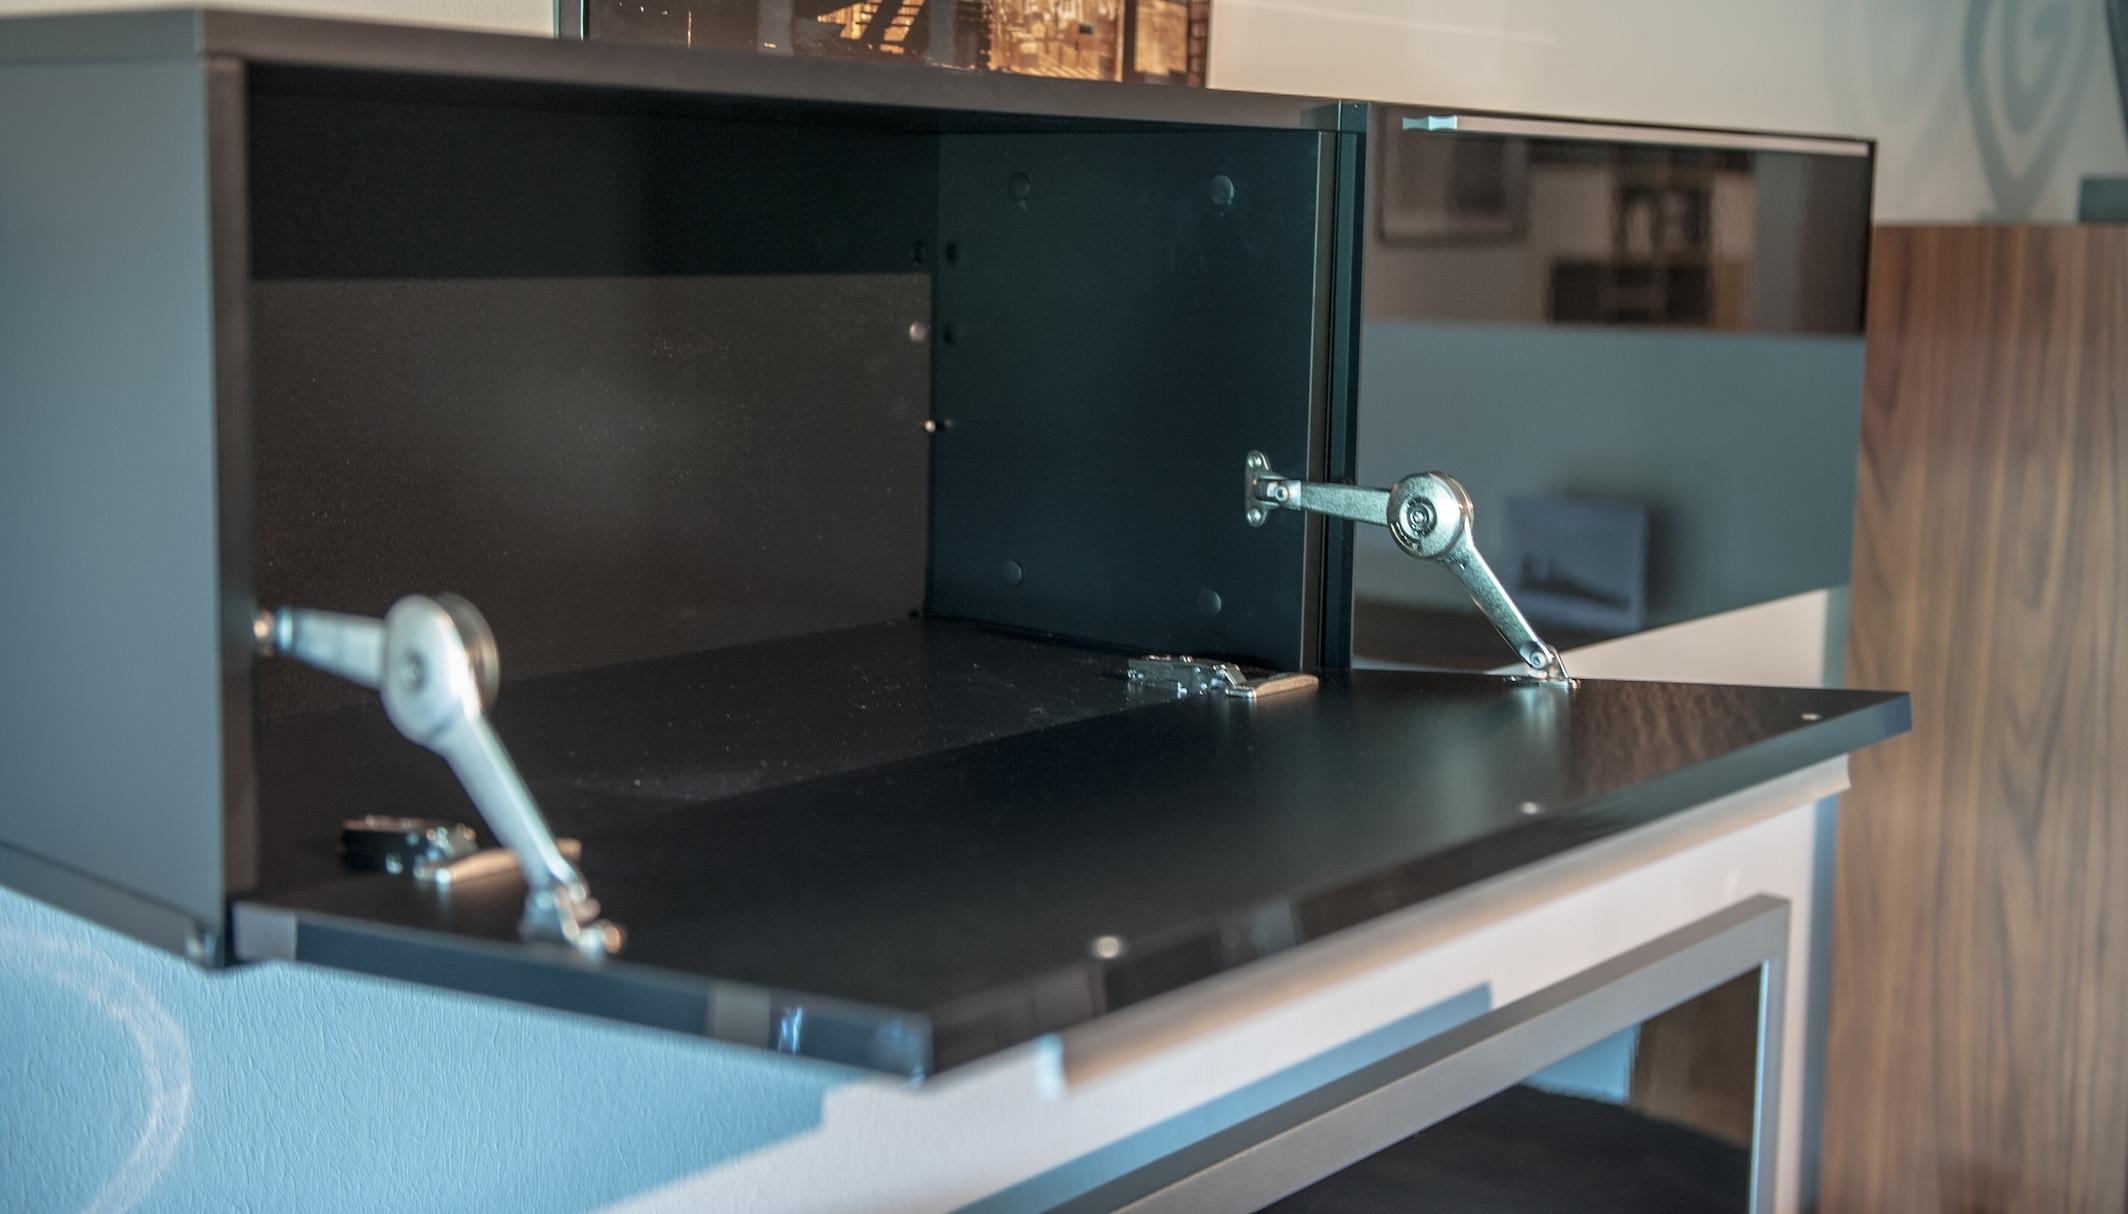 meuble tv marque now storanza. Black Bedroom Furniture Sets. Home Design Ideas